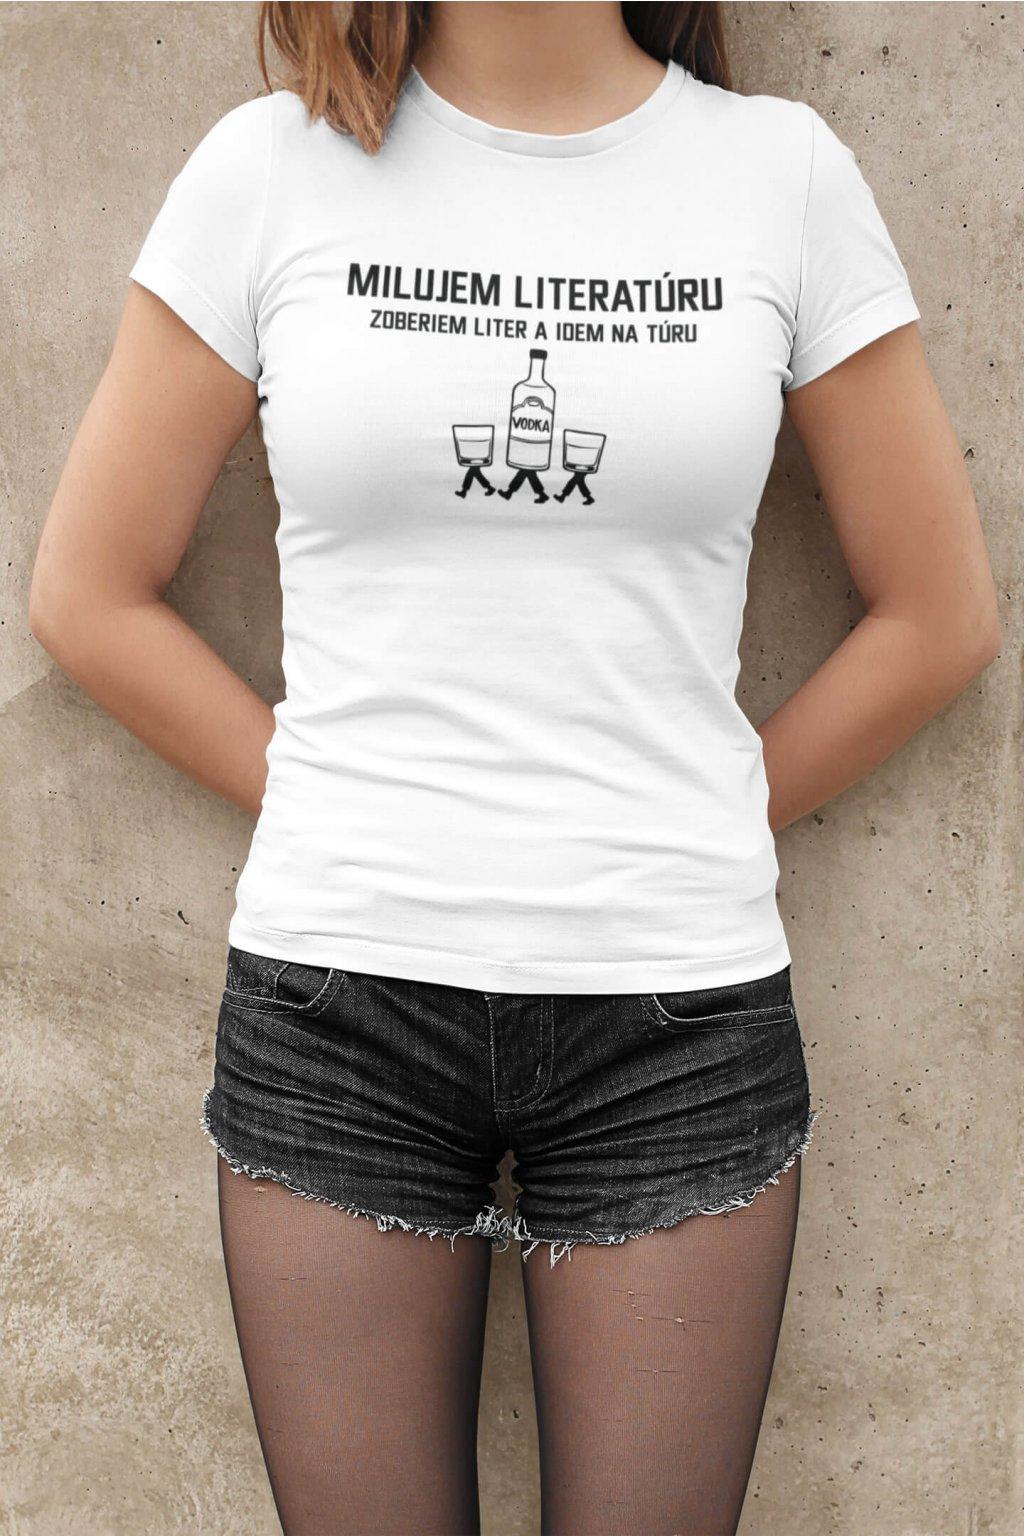 Dámske tričko Milujem literatúru